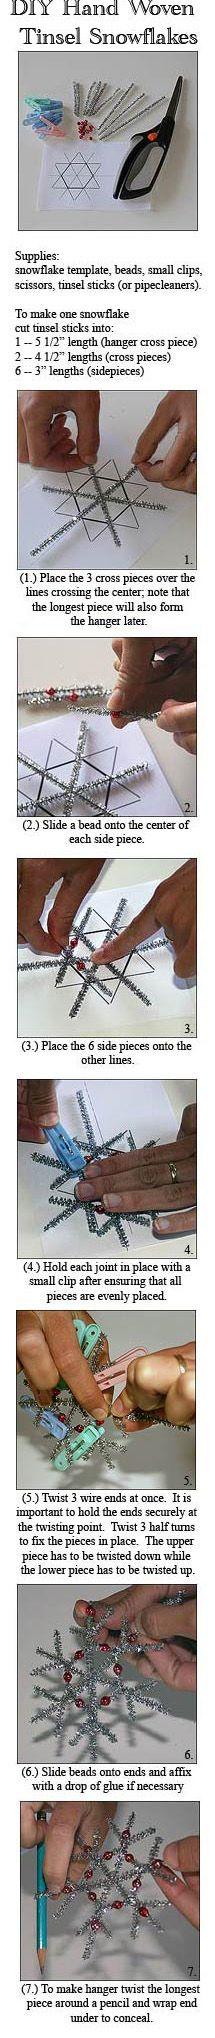 Make your own tinsel snowflake Christmas decoration